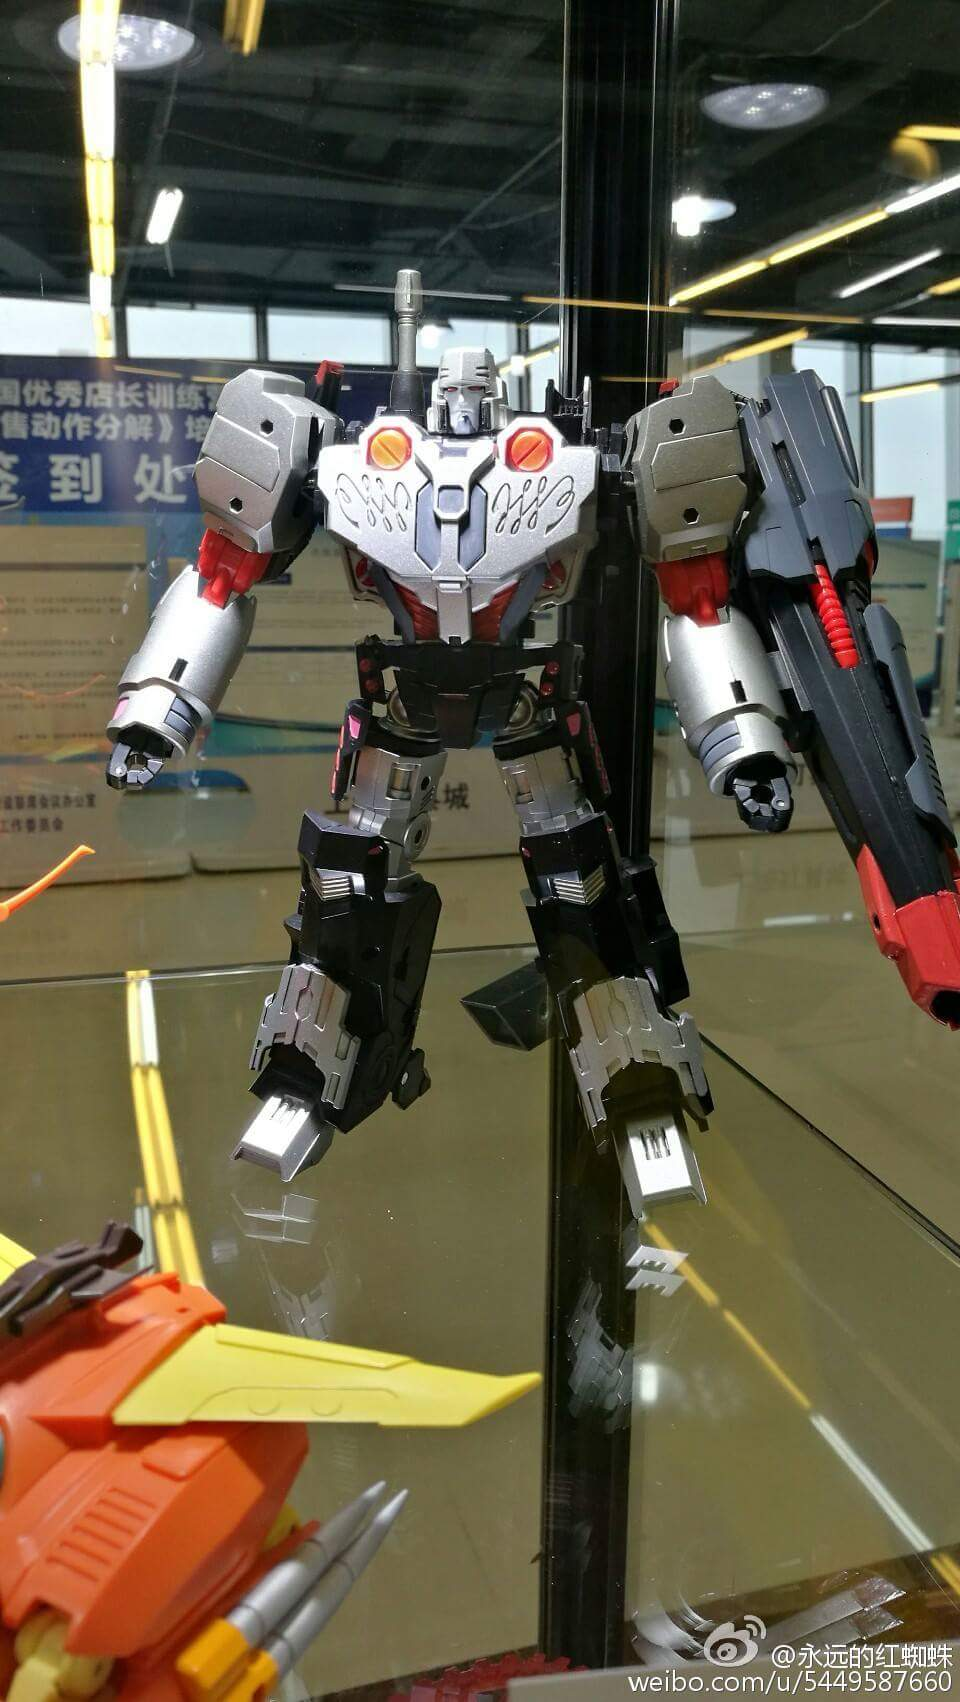 [Mastermind Creations] Produit Tiers - Reformatted R-28 Tyrantron - aka Megatron des BD IDW MOfTZxmR